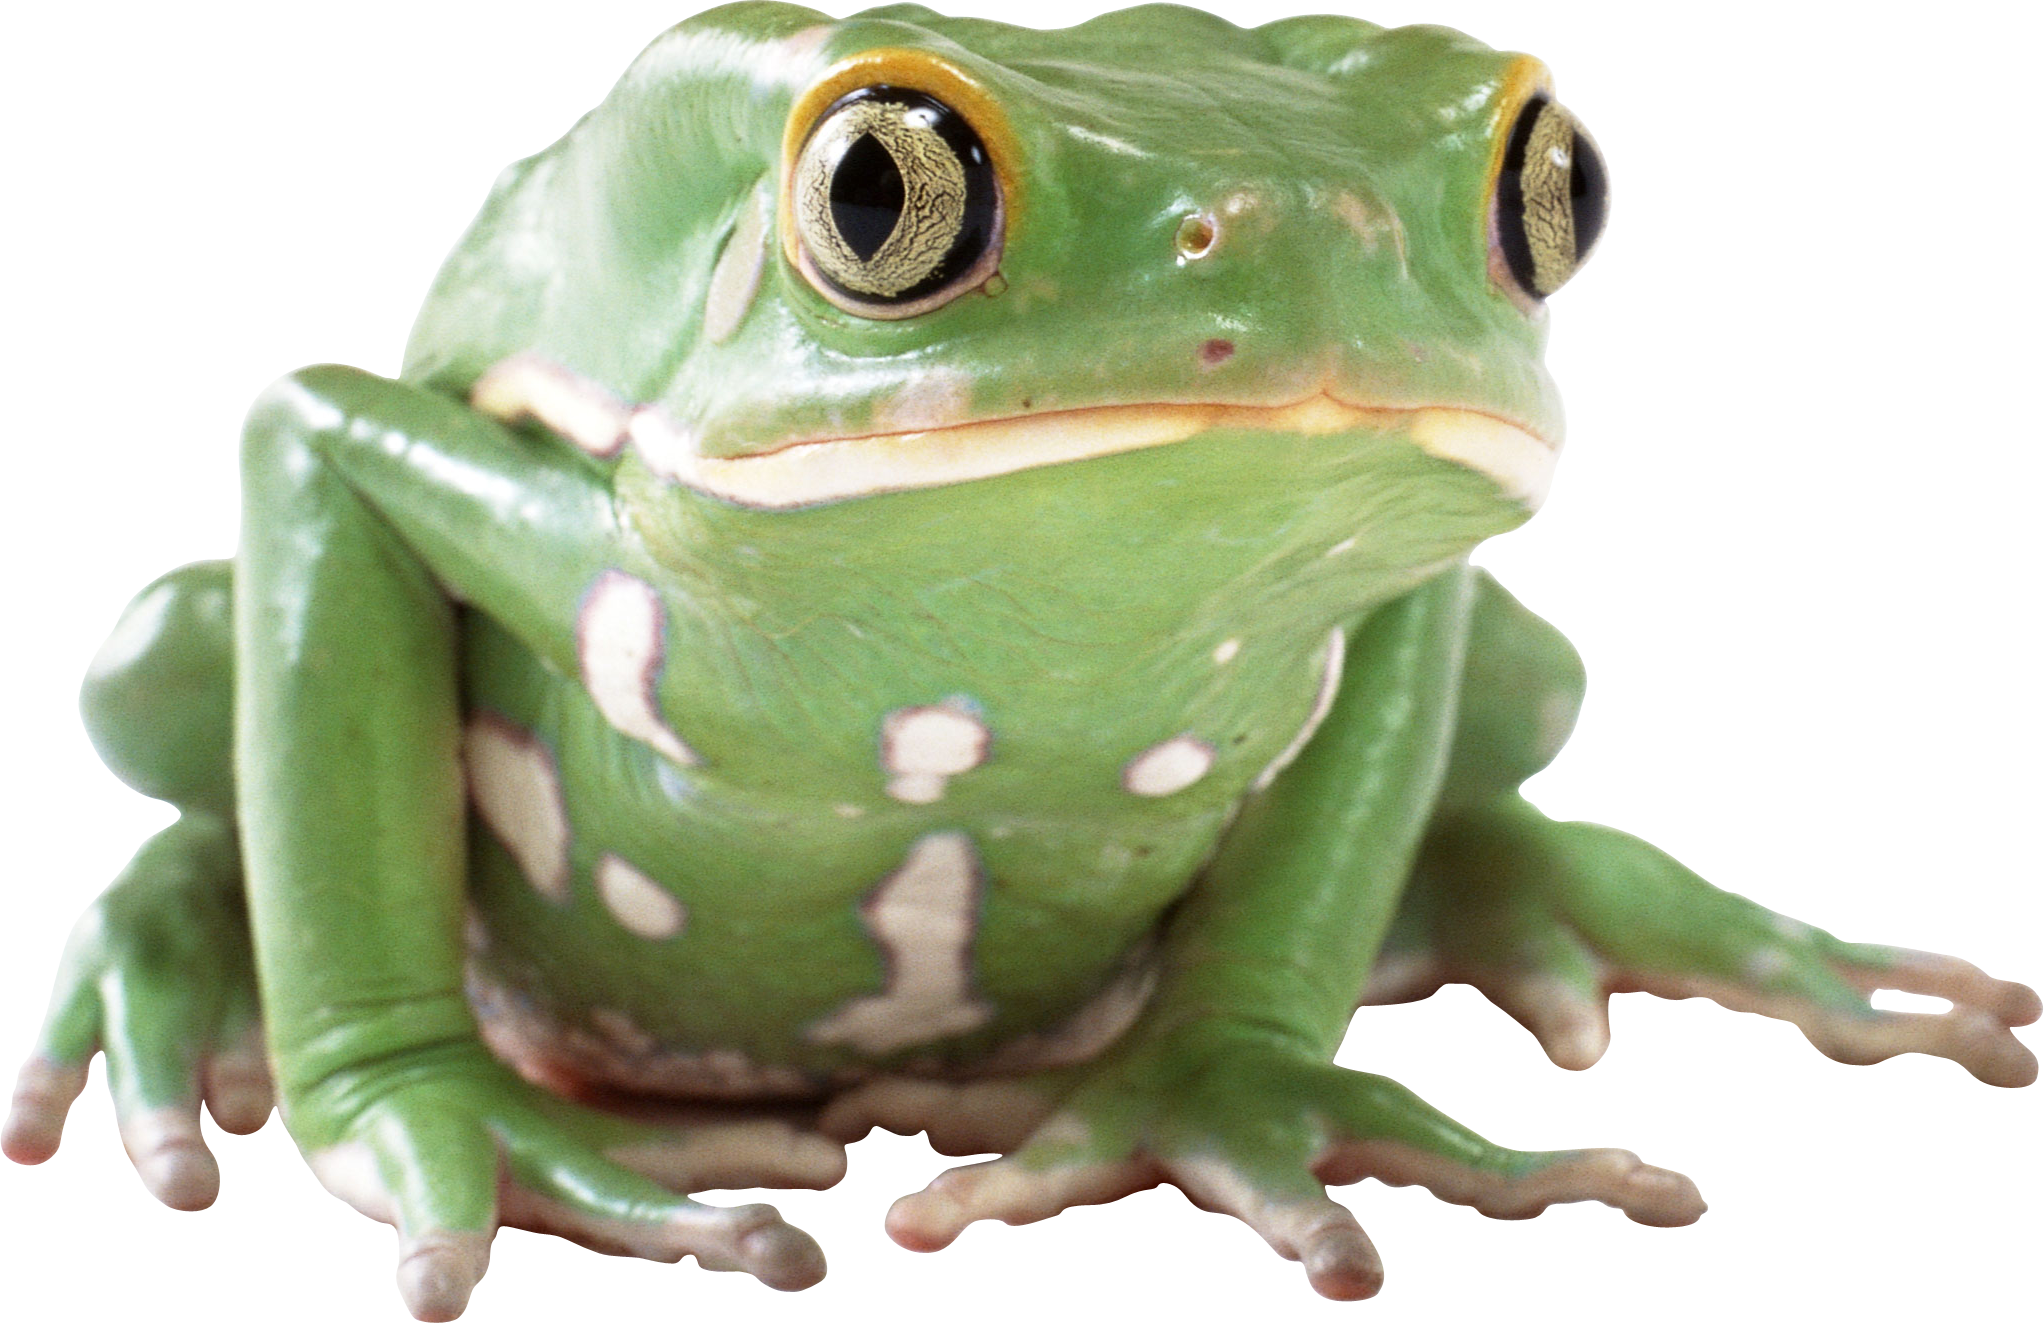 frog PNG image - Frog PNG HD